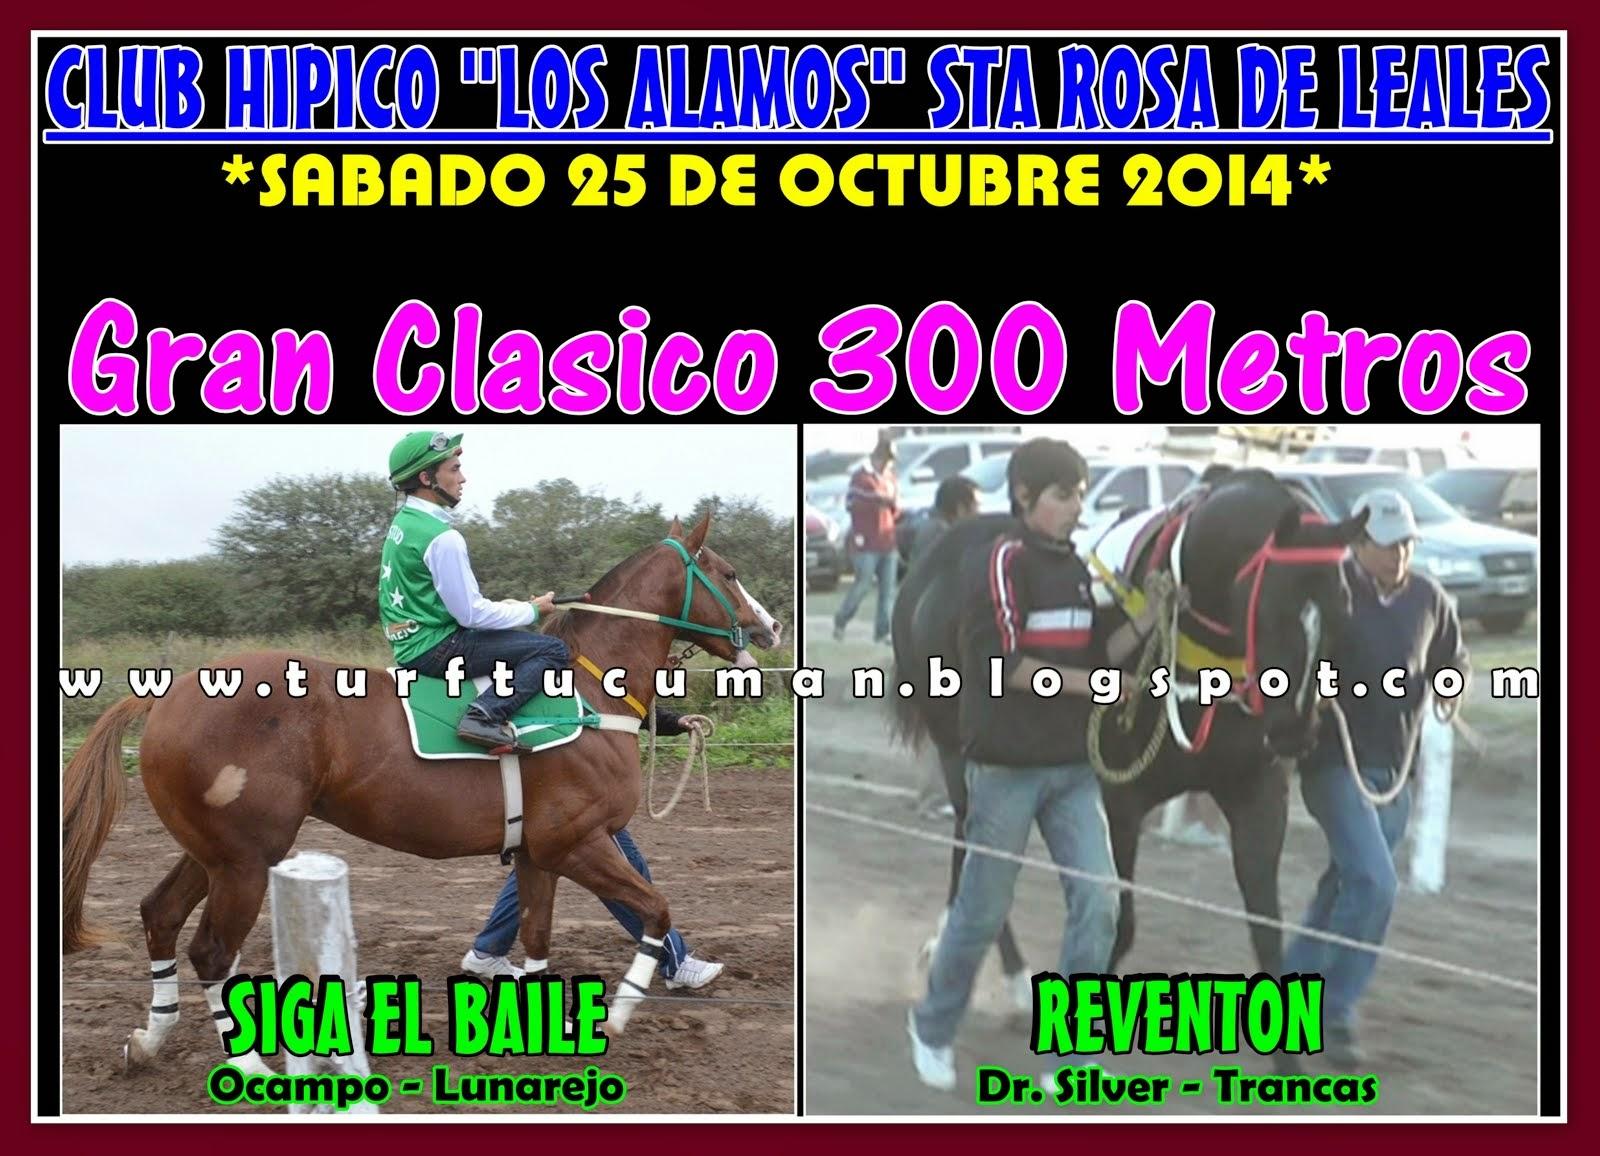 SIGA EL BAILE VS REVENTON